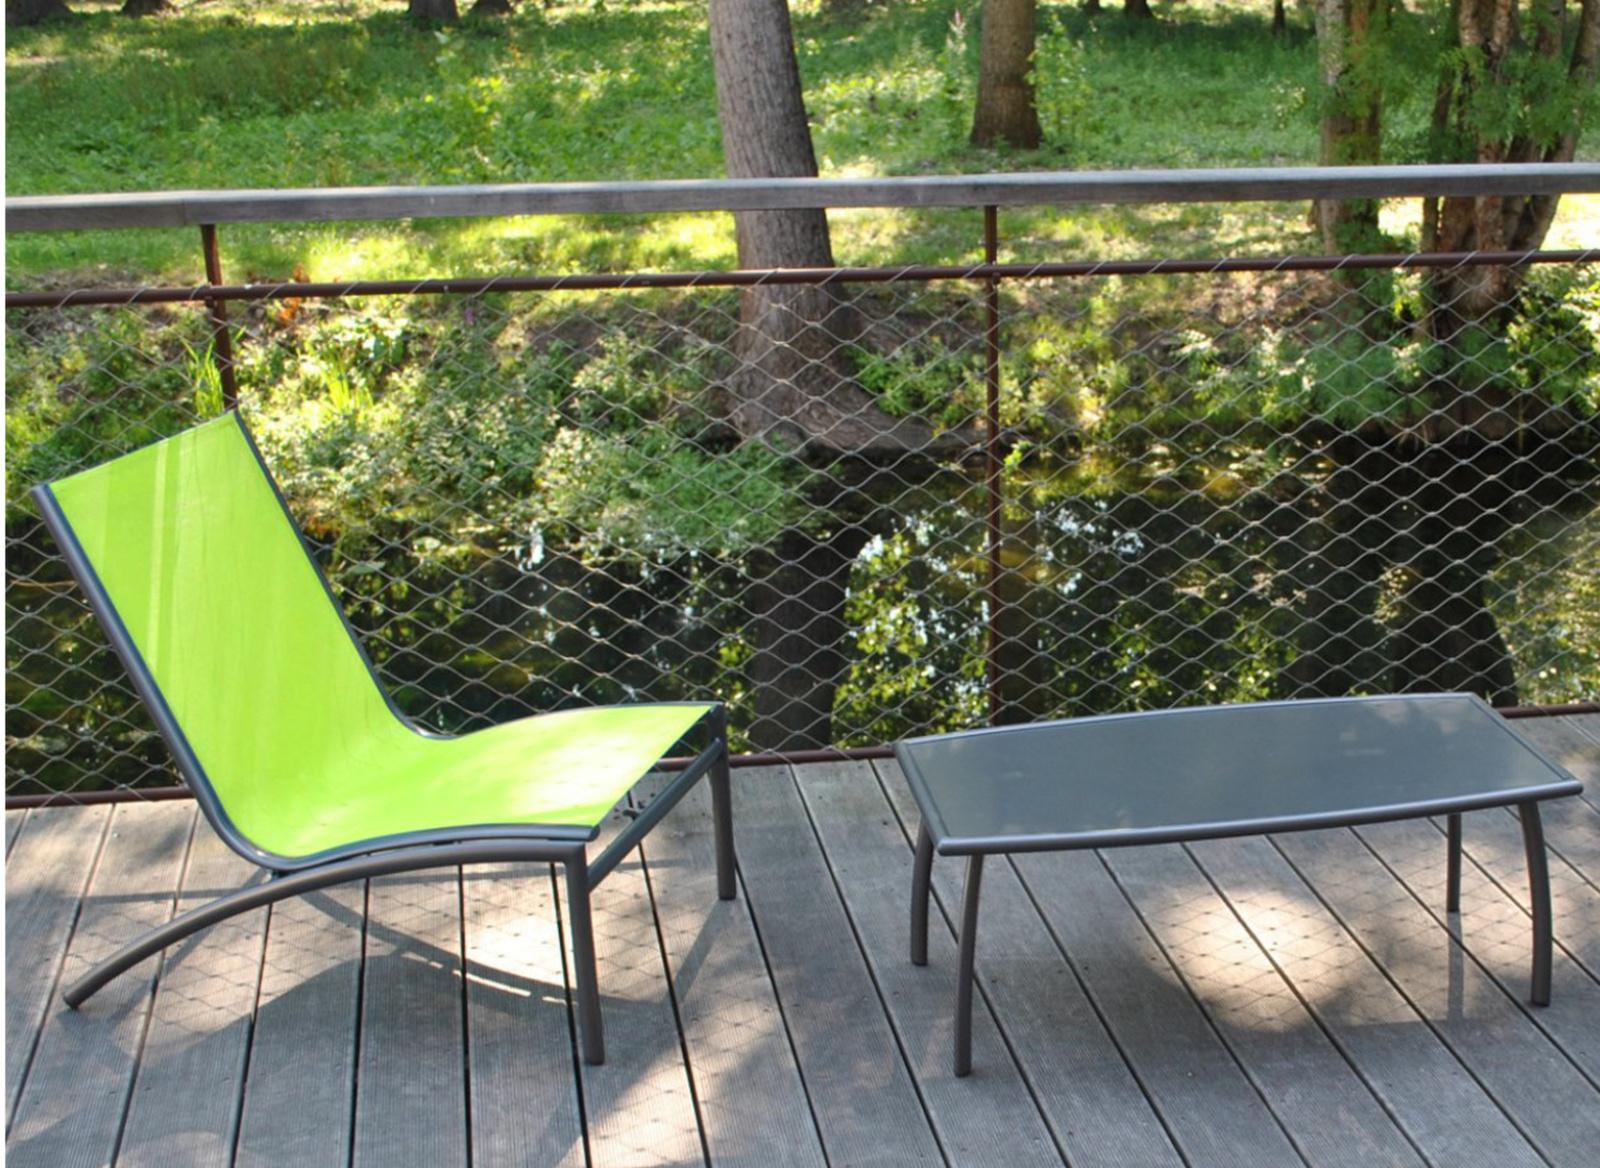 Mobilier de jardin soldes mobilier jardin soldes 5 table for Chaise de jardin en solde